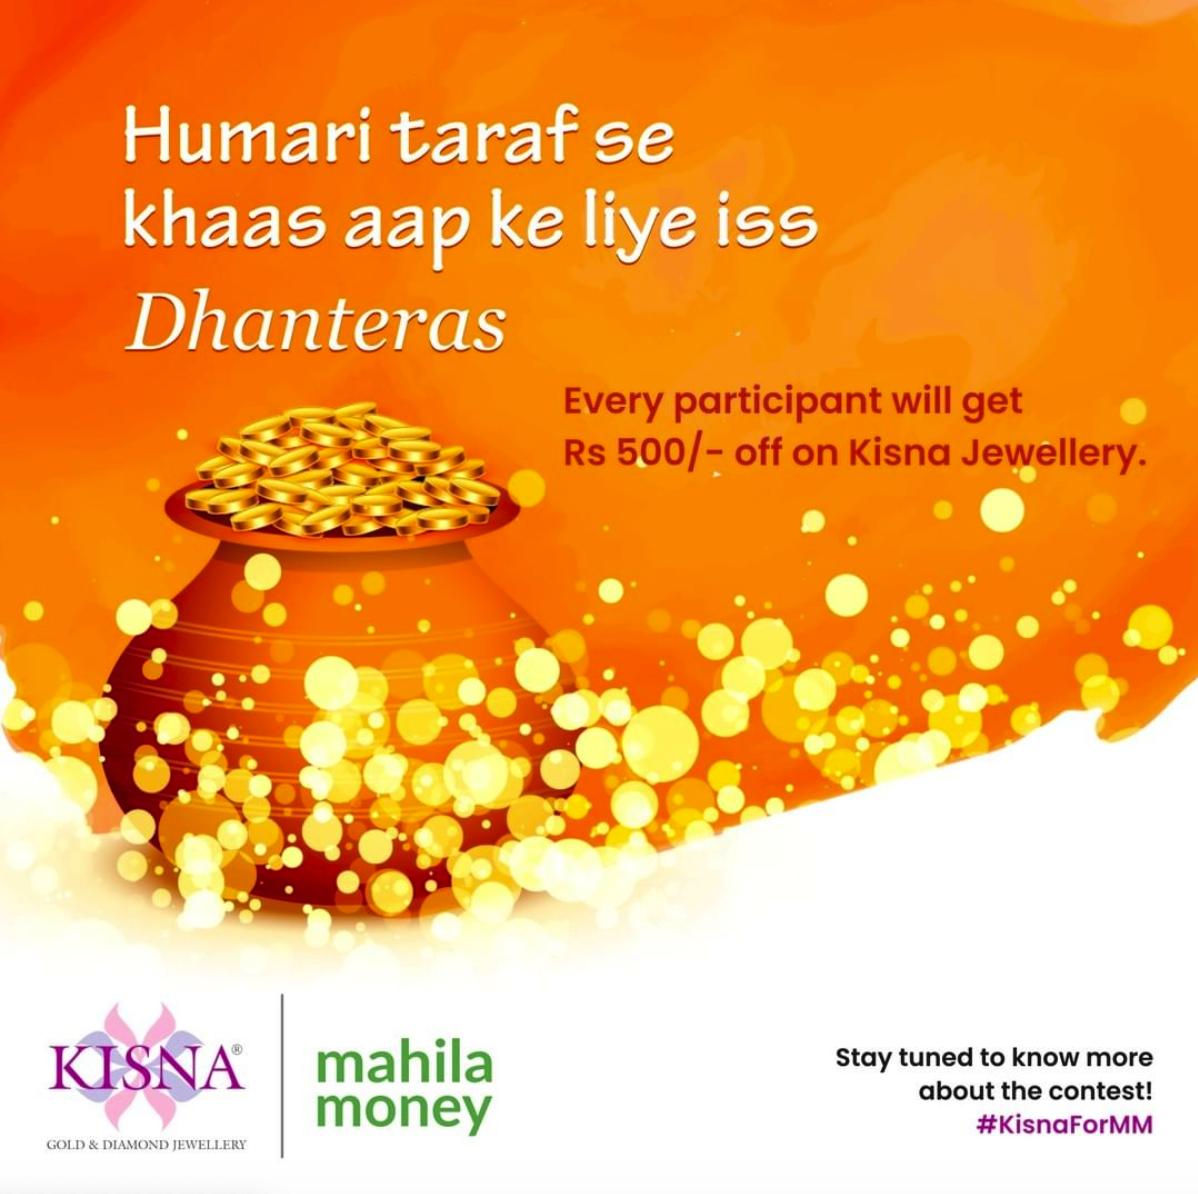 Kisna campaign